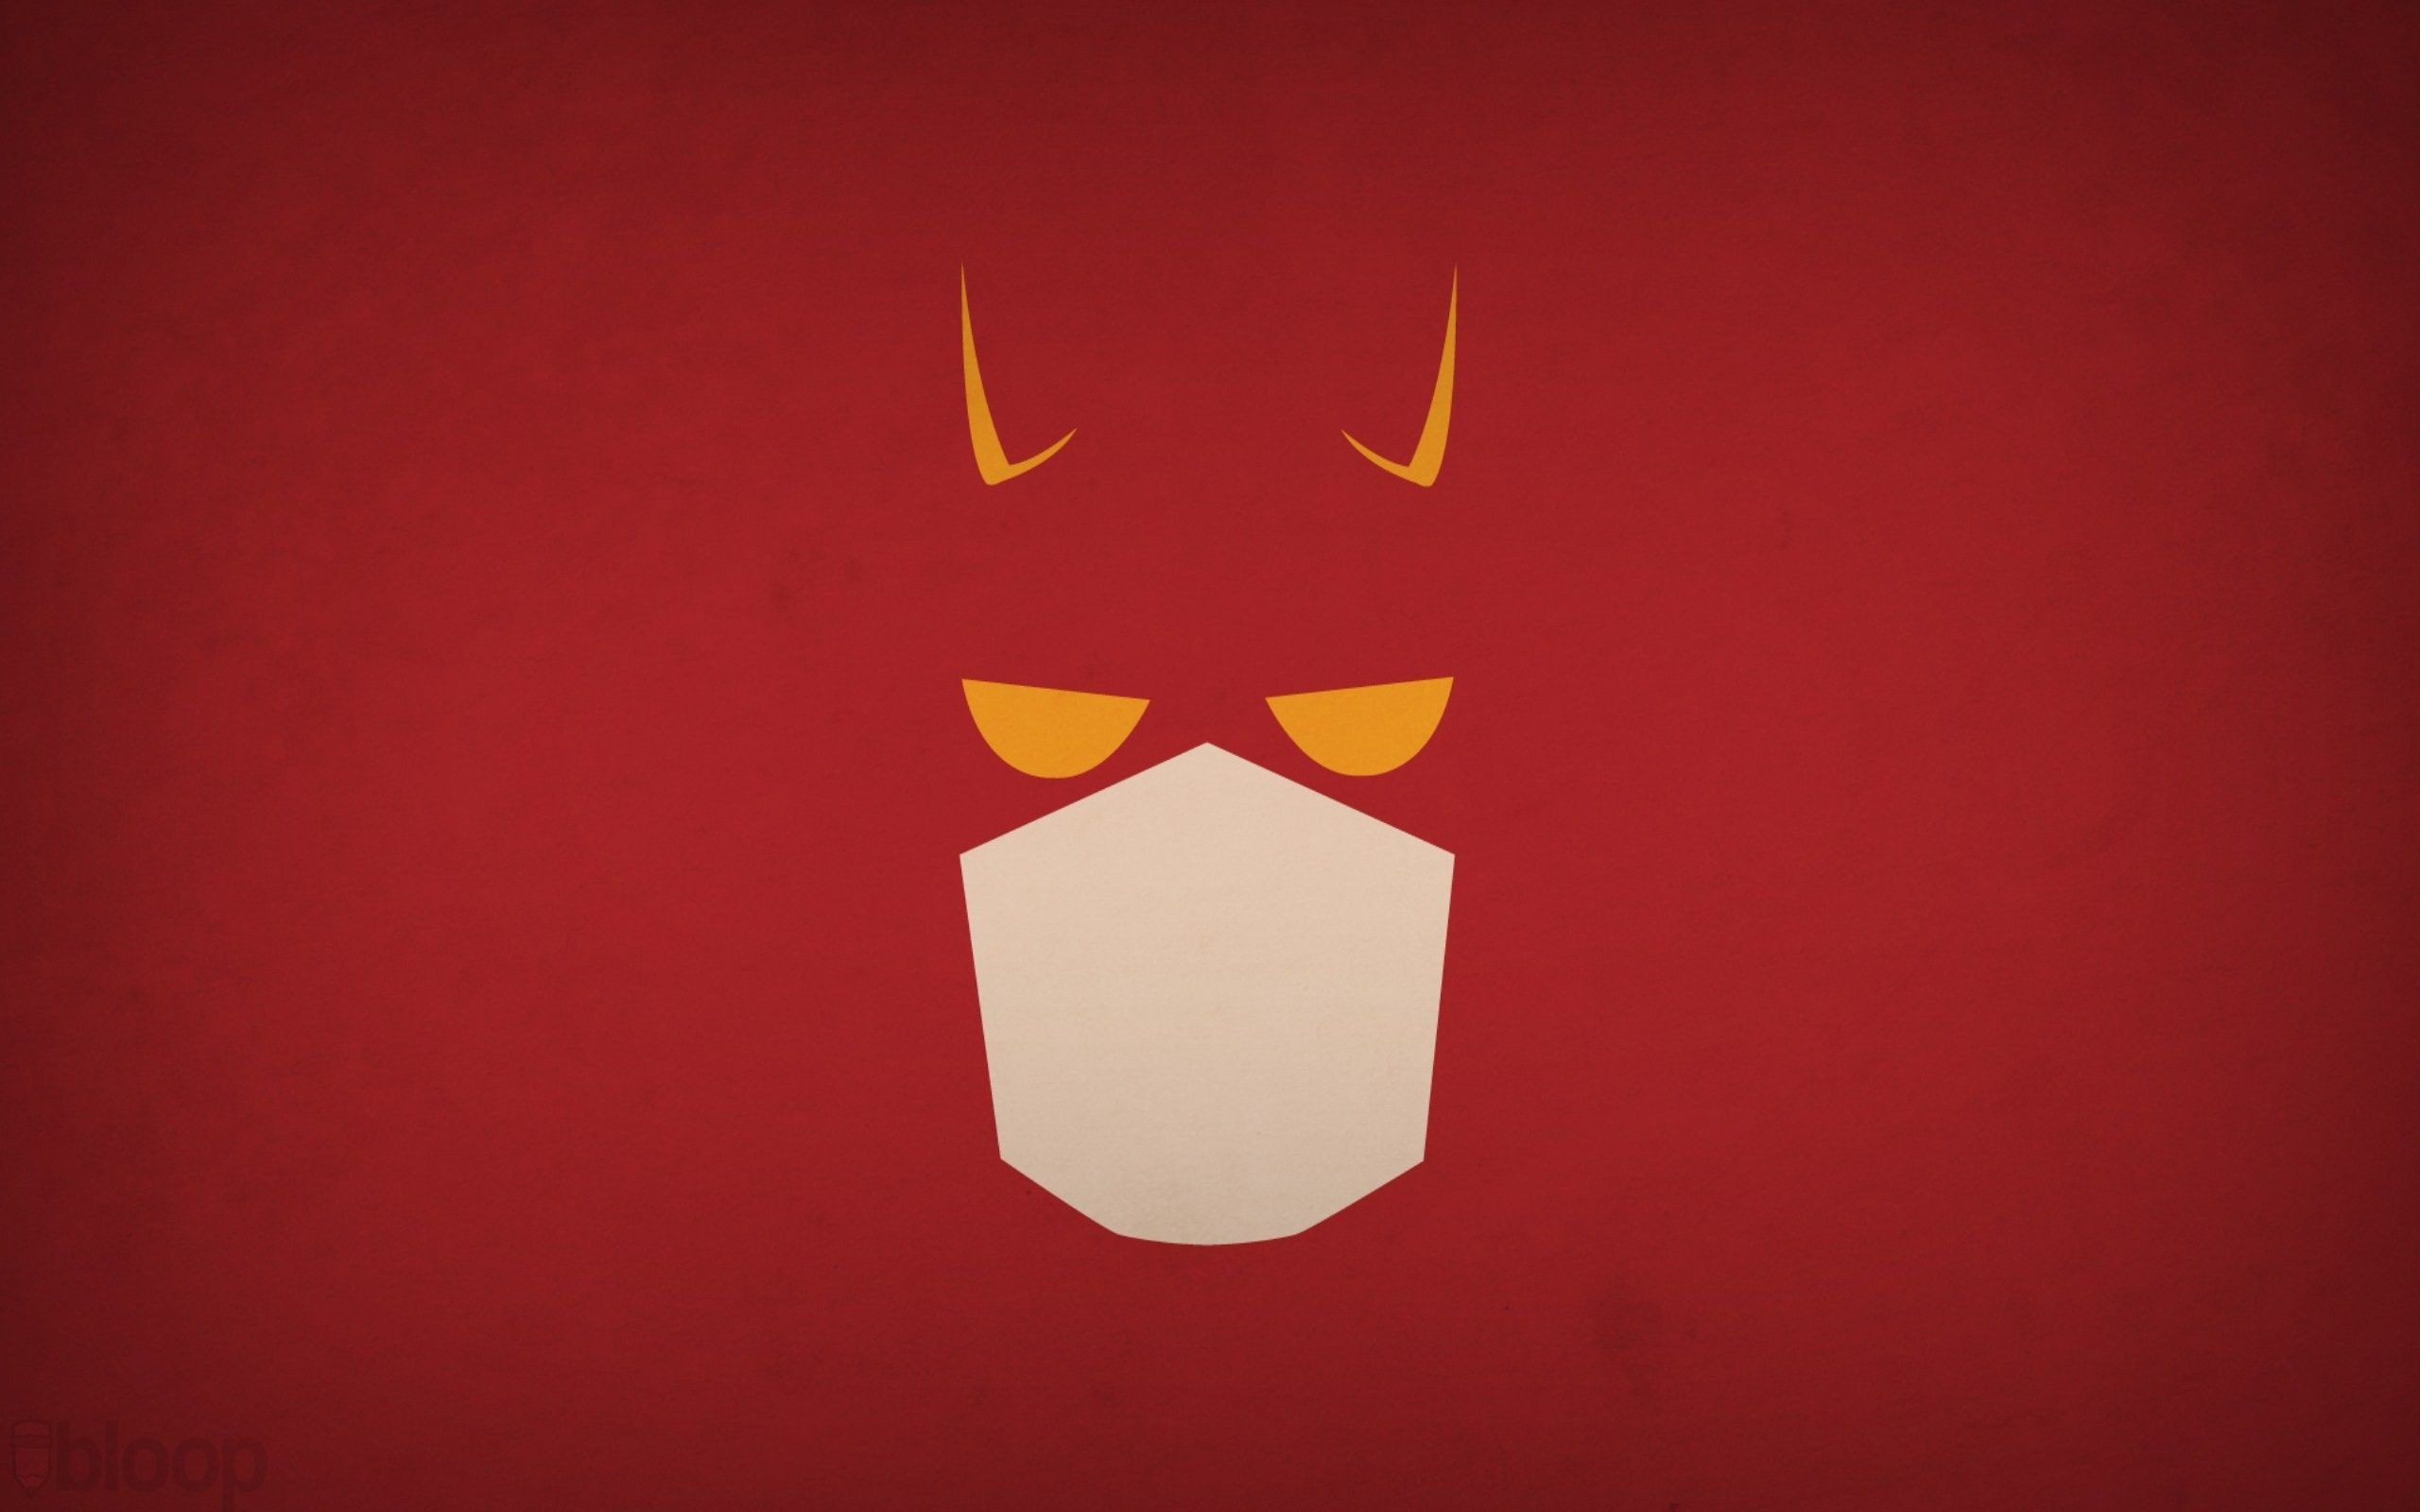 2560×1440 Daredevil Illustration YouTube Channel Cover